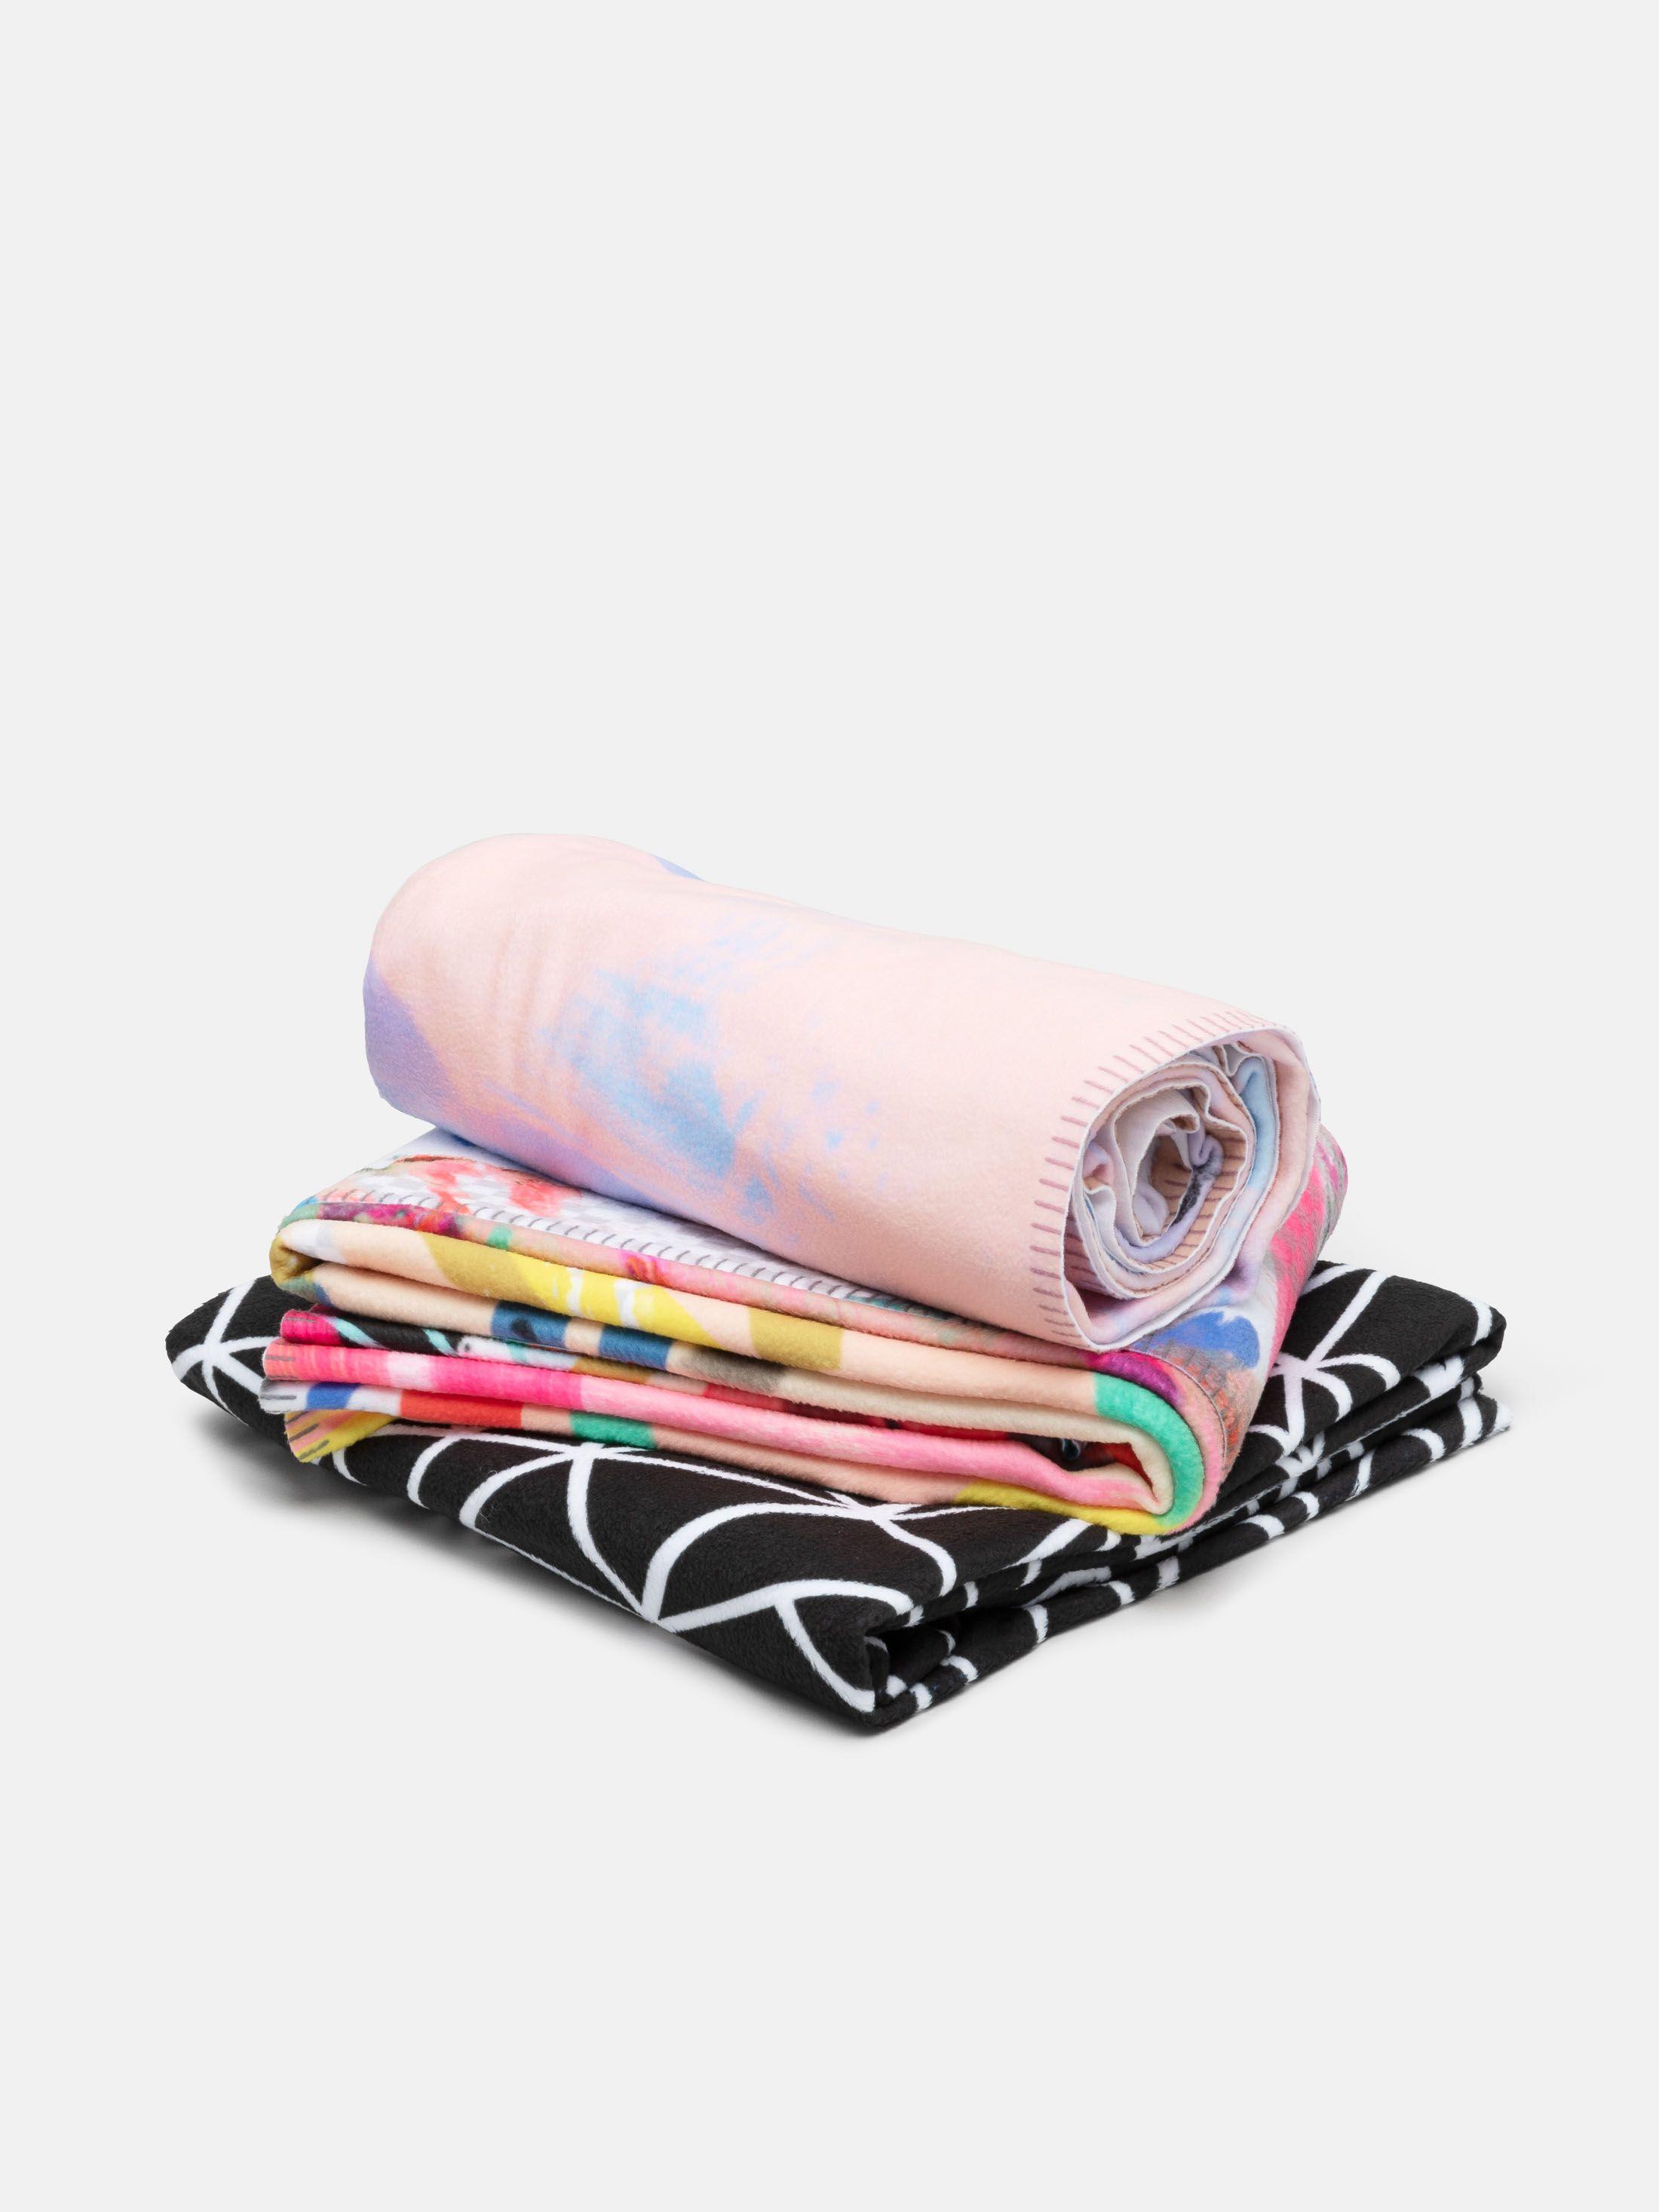 Single Layer blanket printed pattern